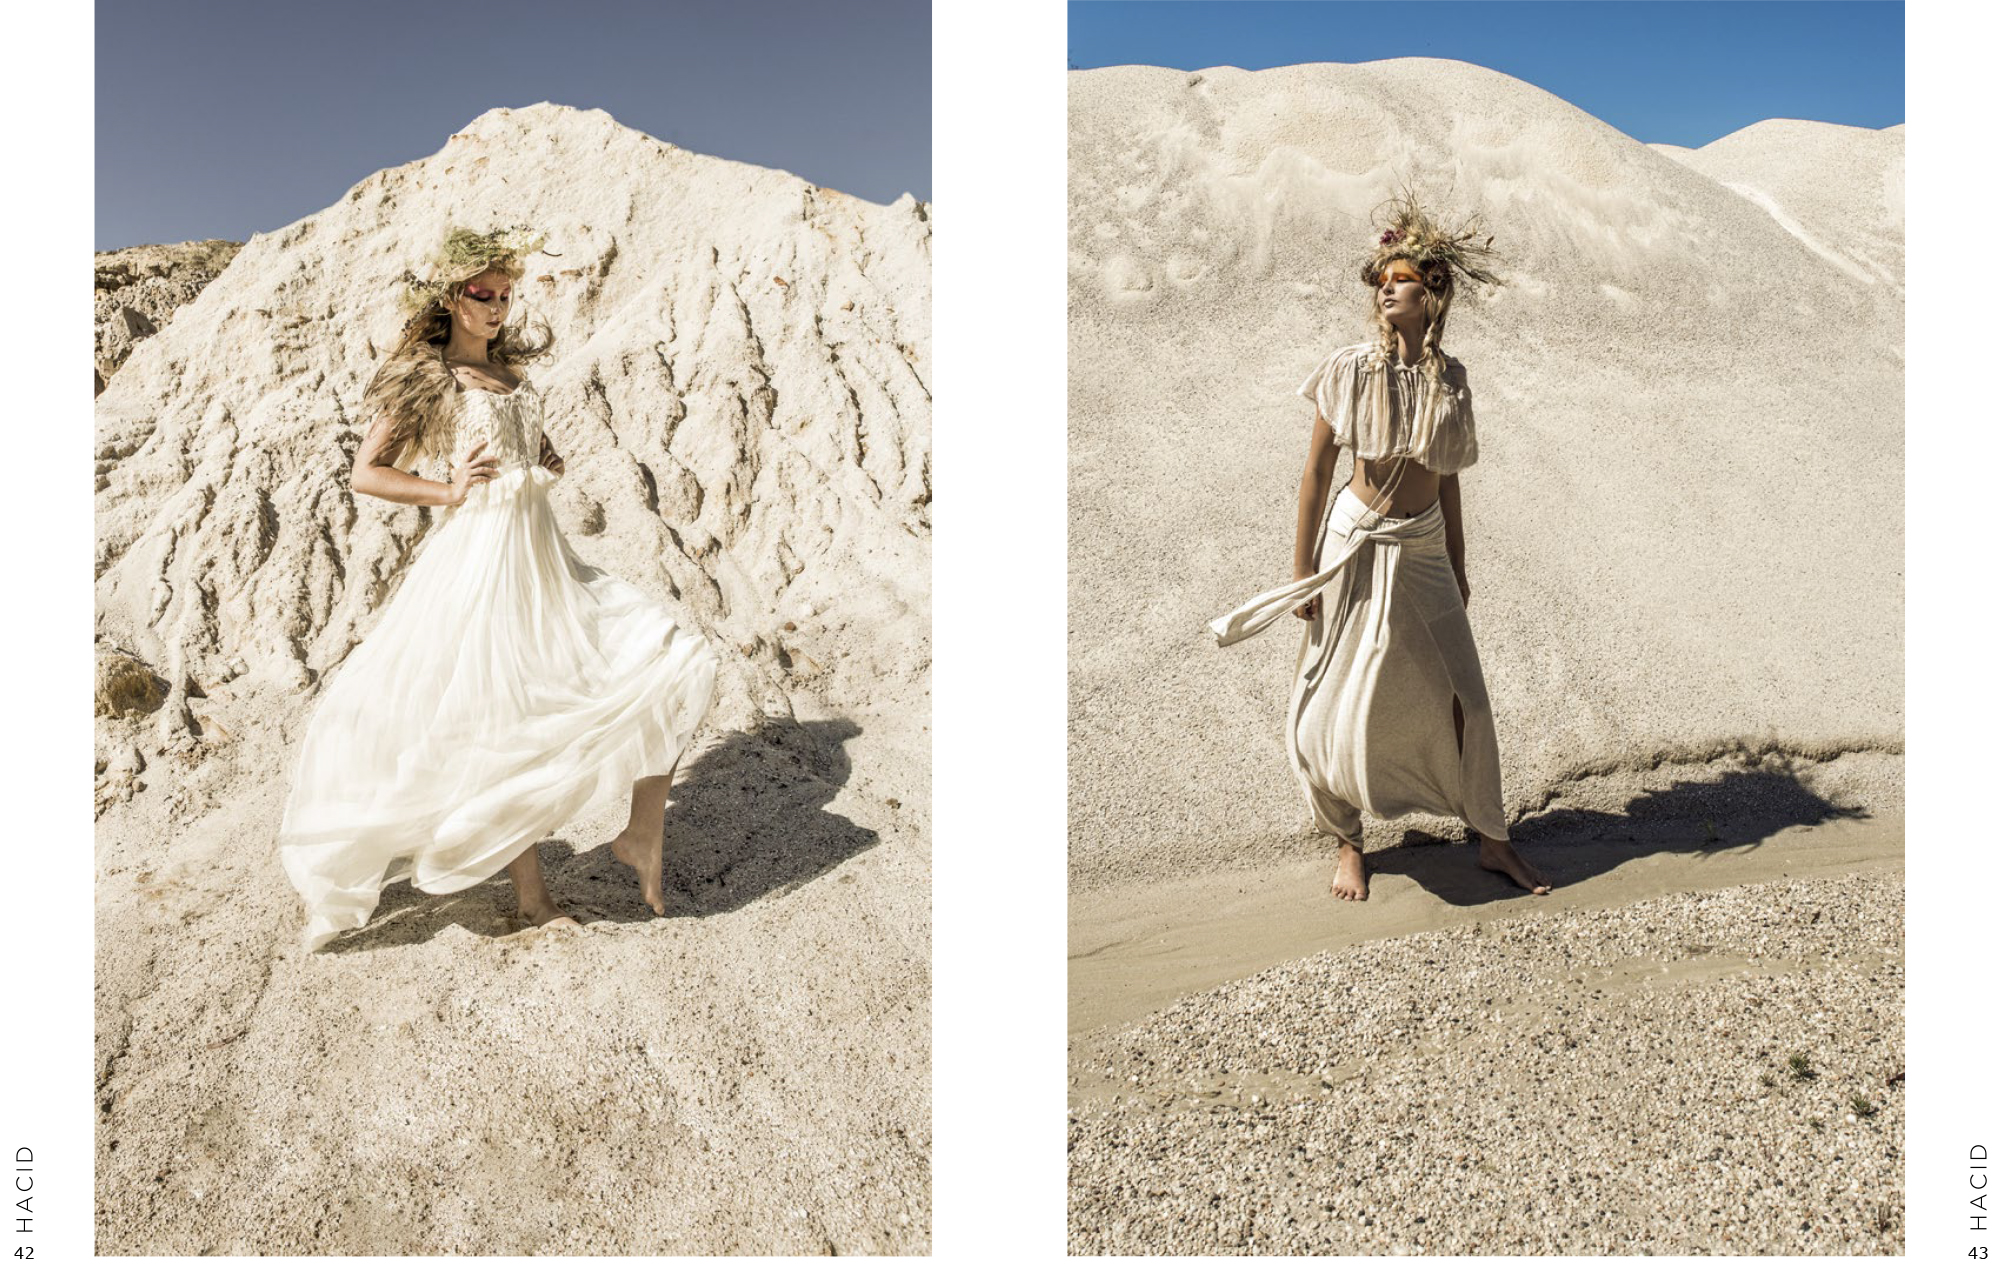 white sand white dresses white model  Lisa Brown designs on Hacid magazine